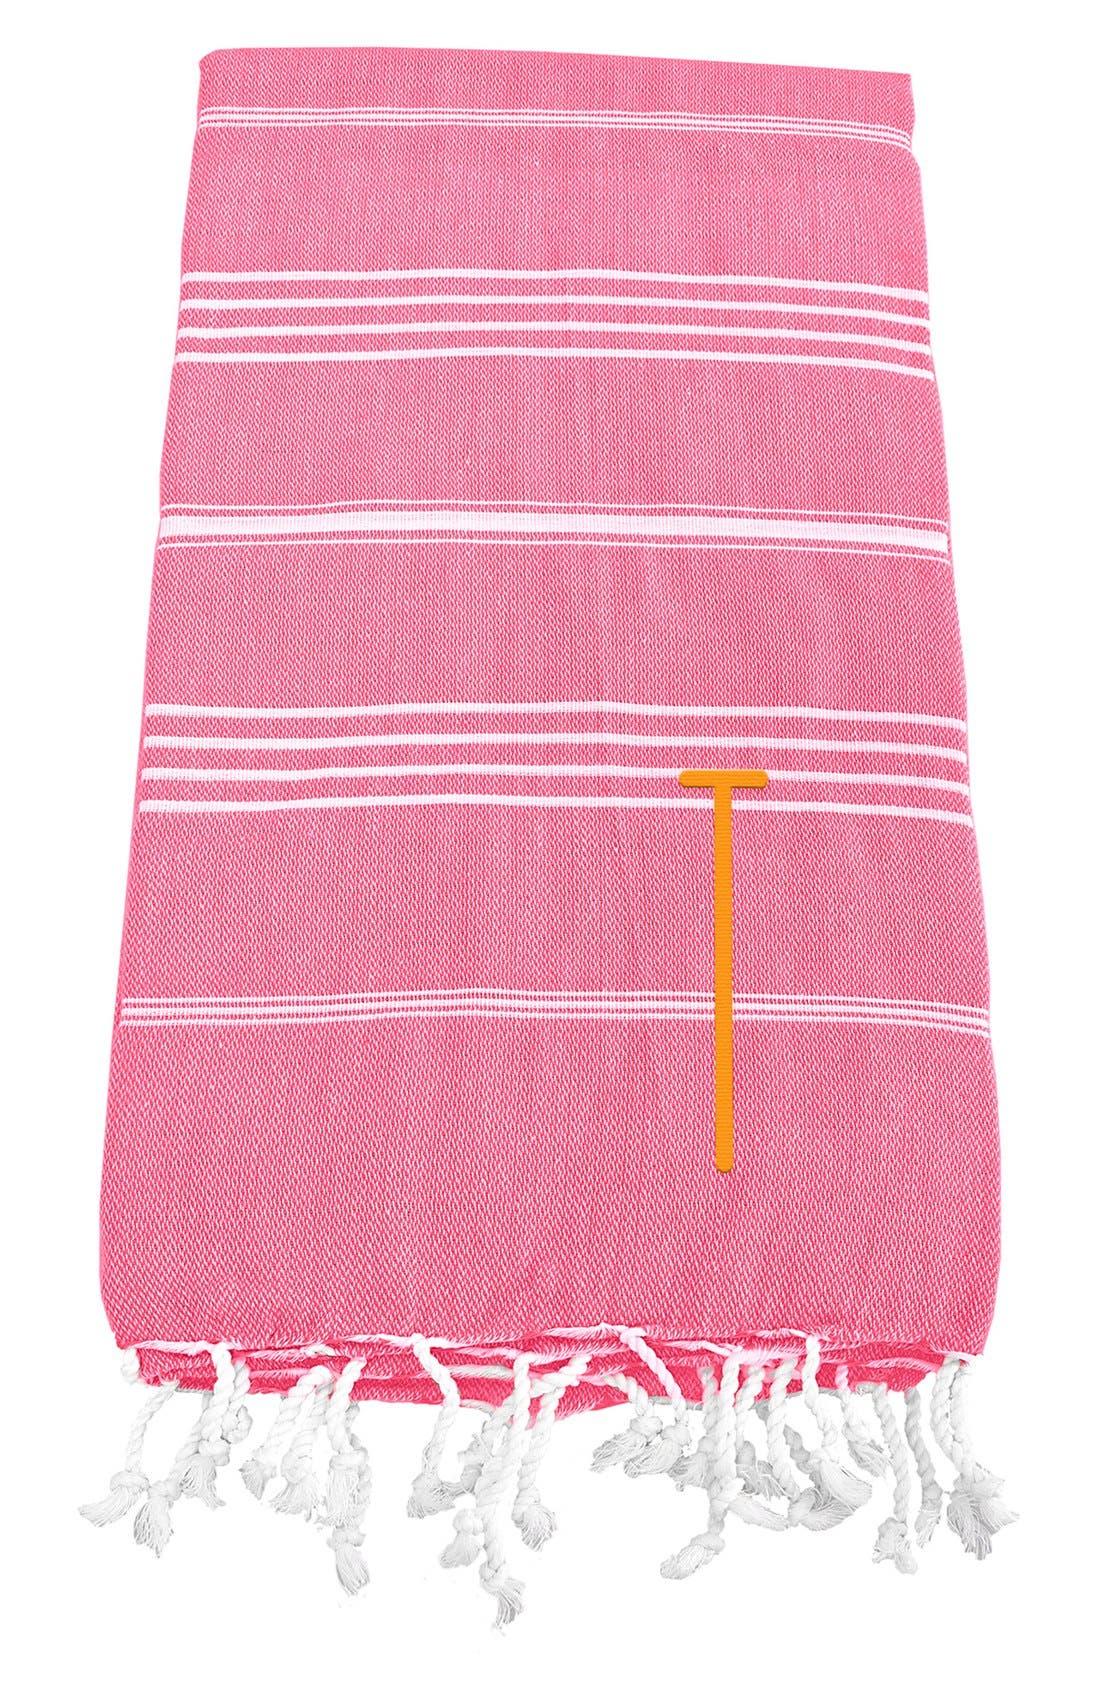 Monogram Turkish Cotton Towel,                             Main thumbnail 156, color,